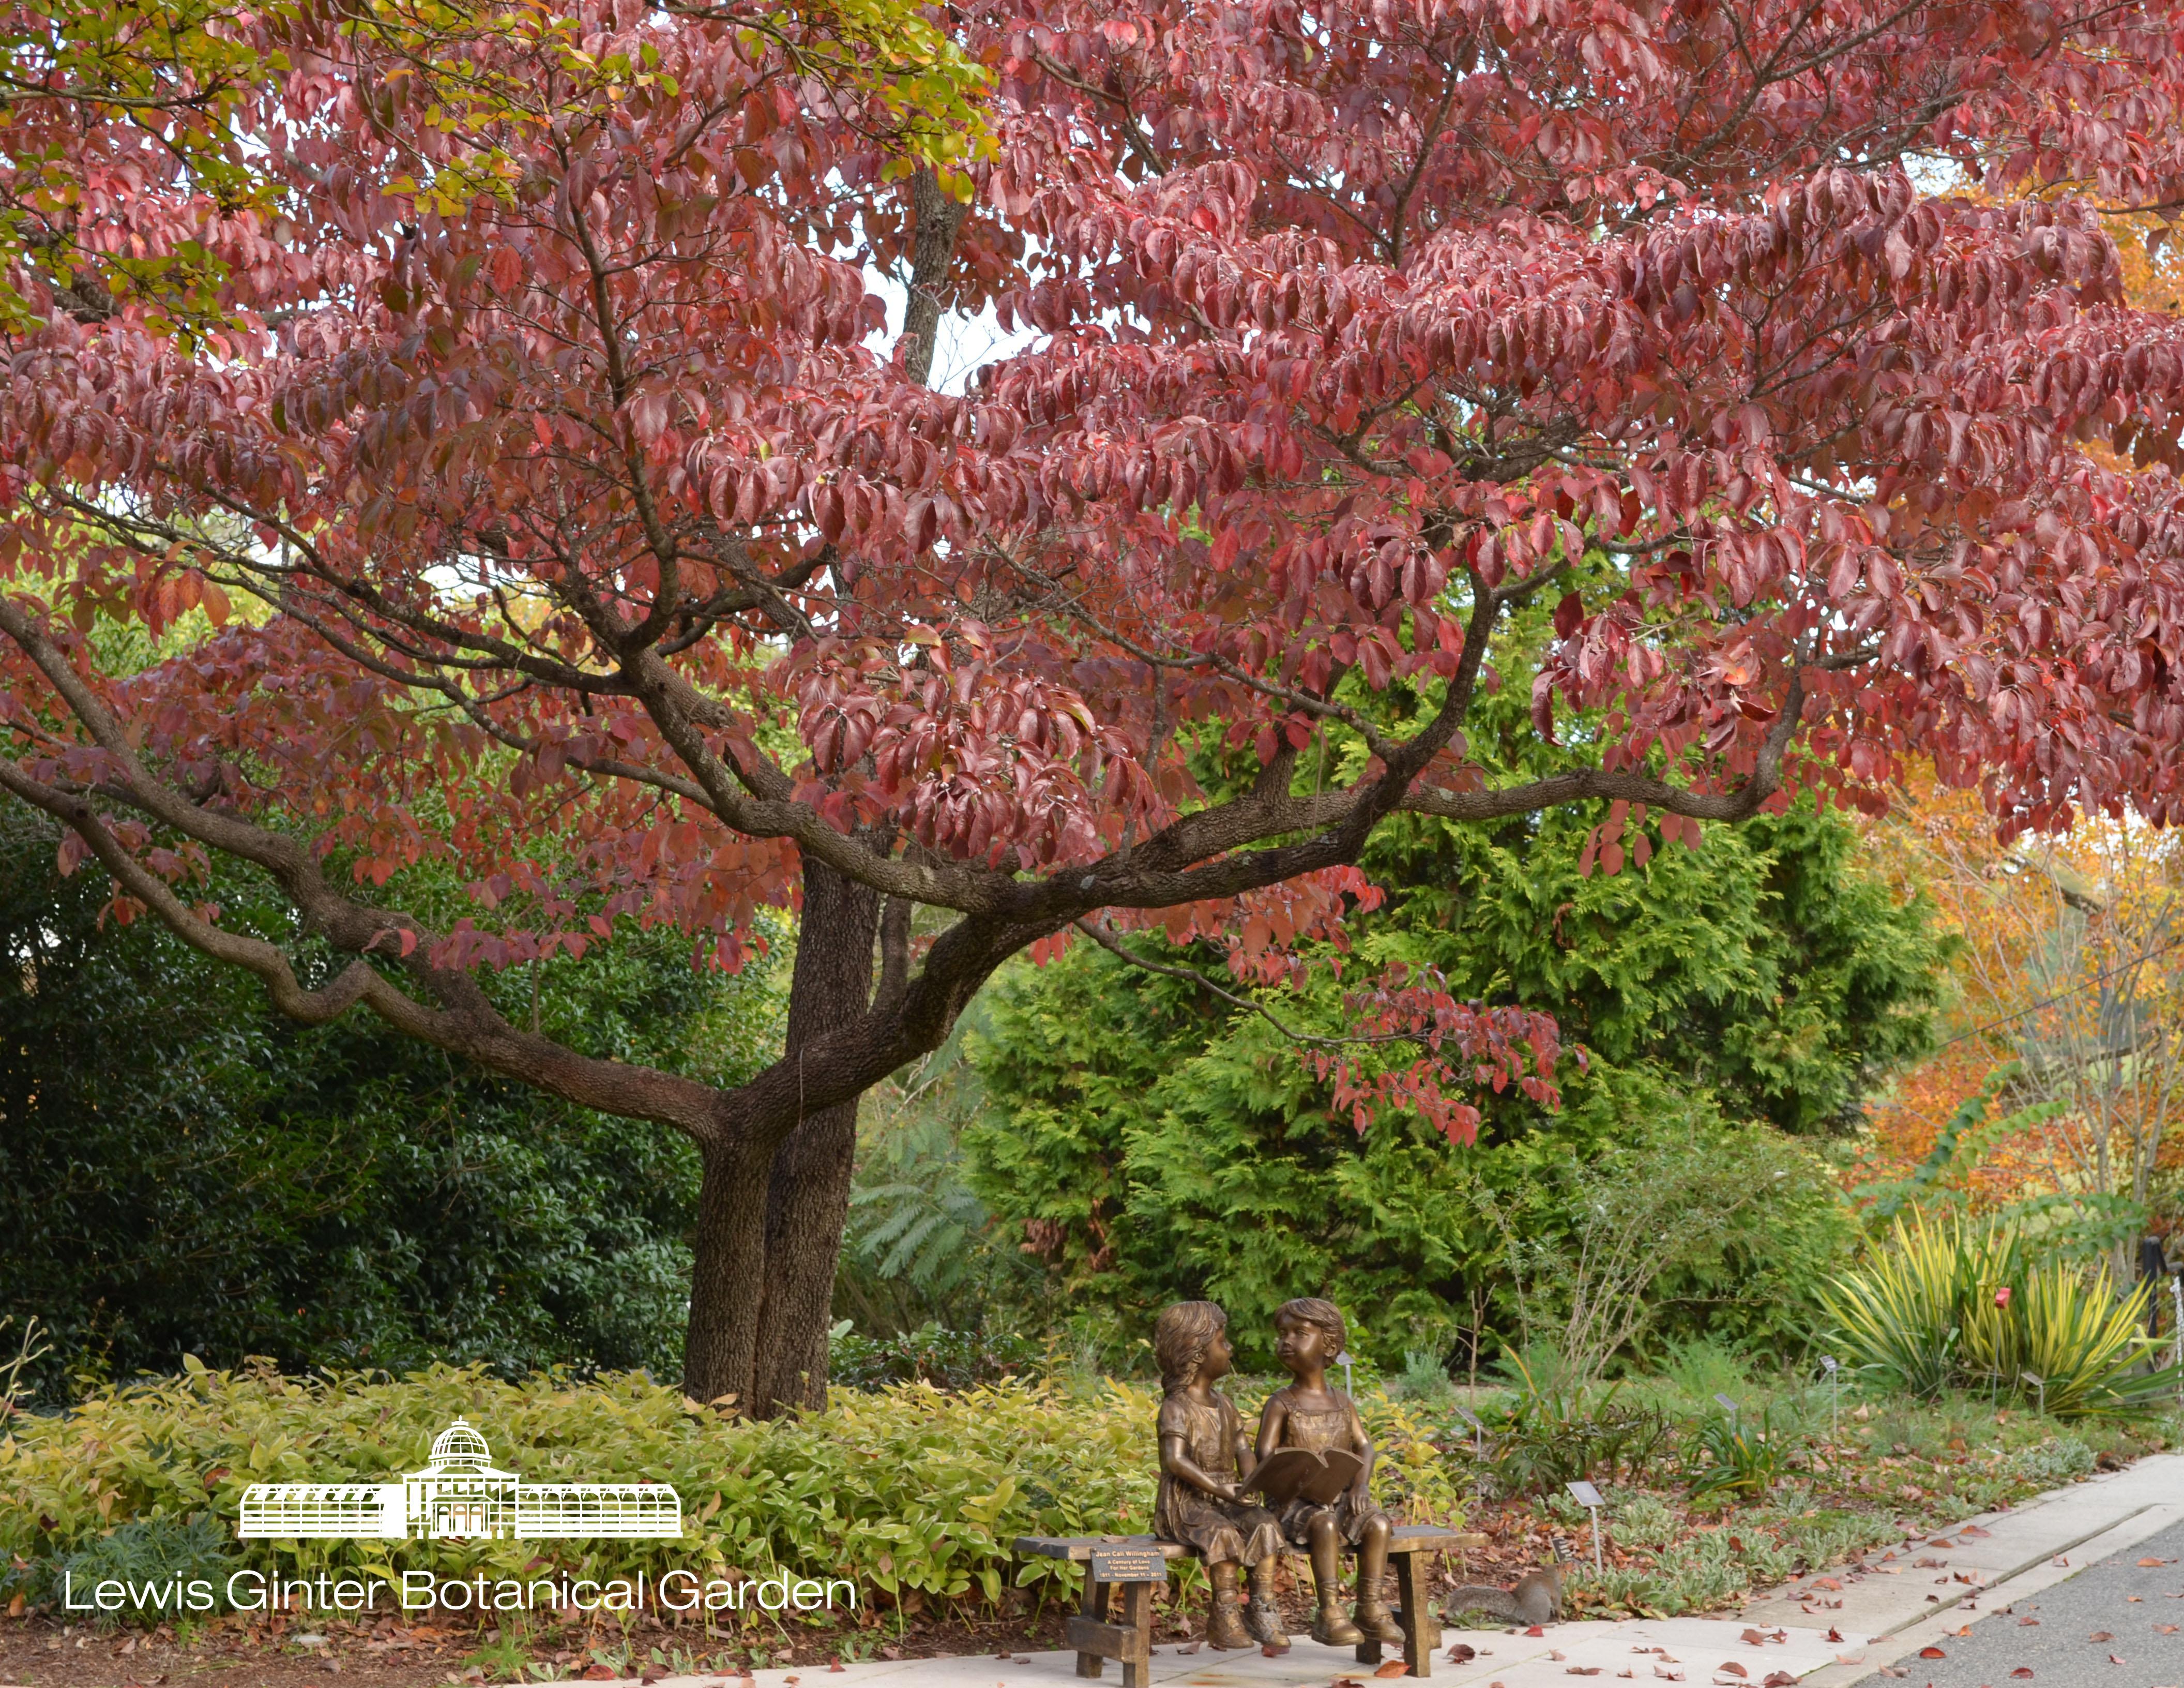 Fall Lewis Ginter Botanical Garden